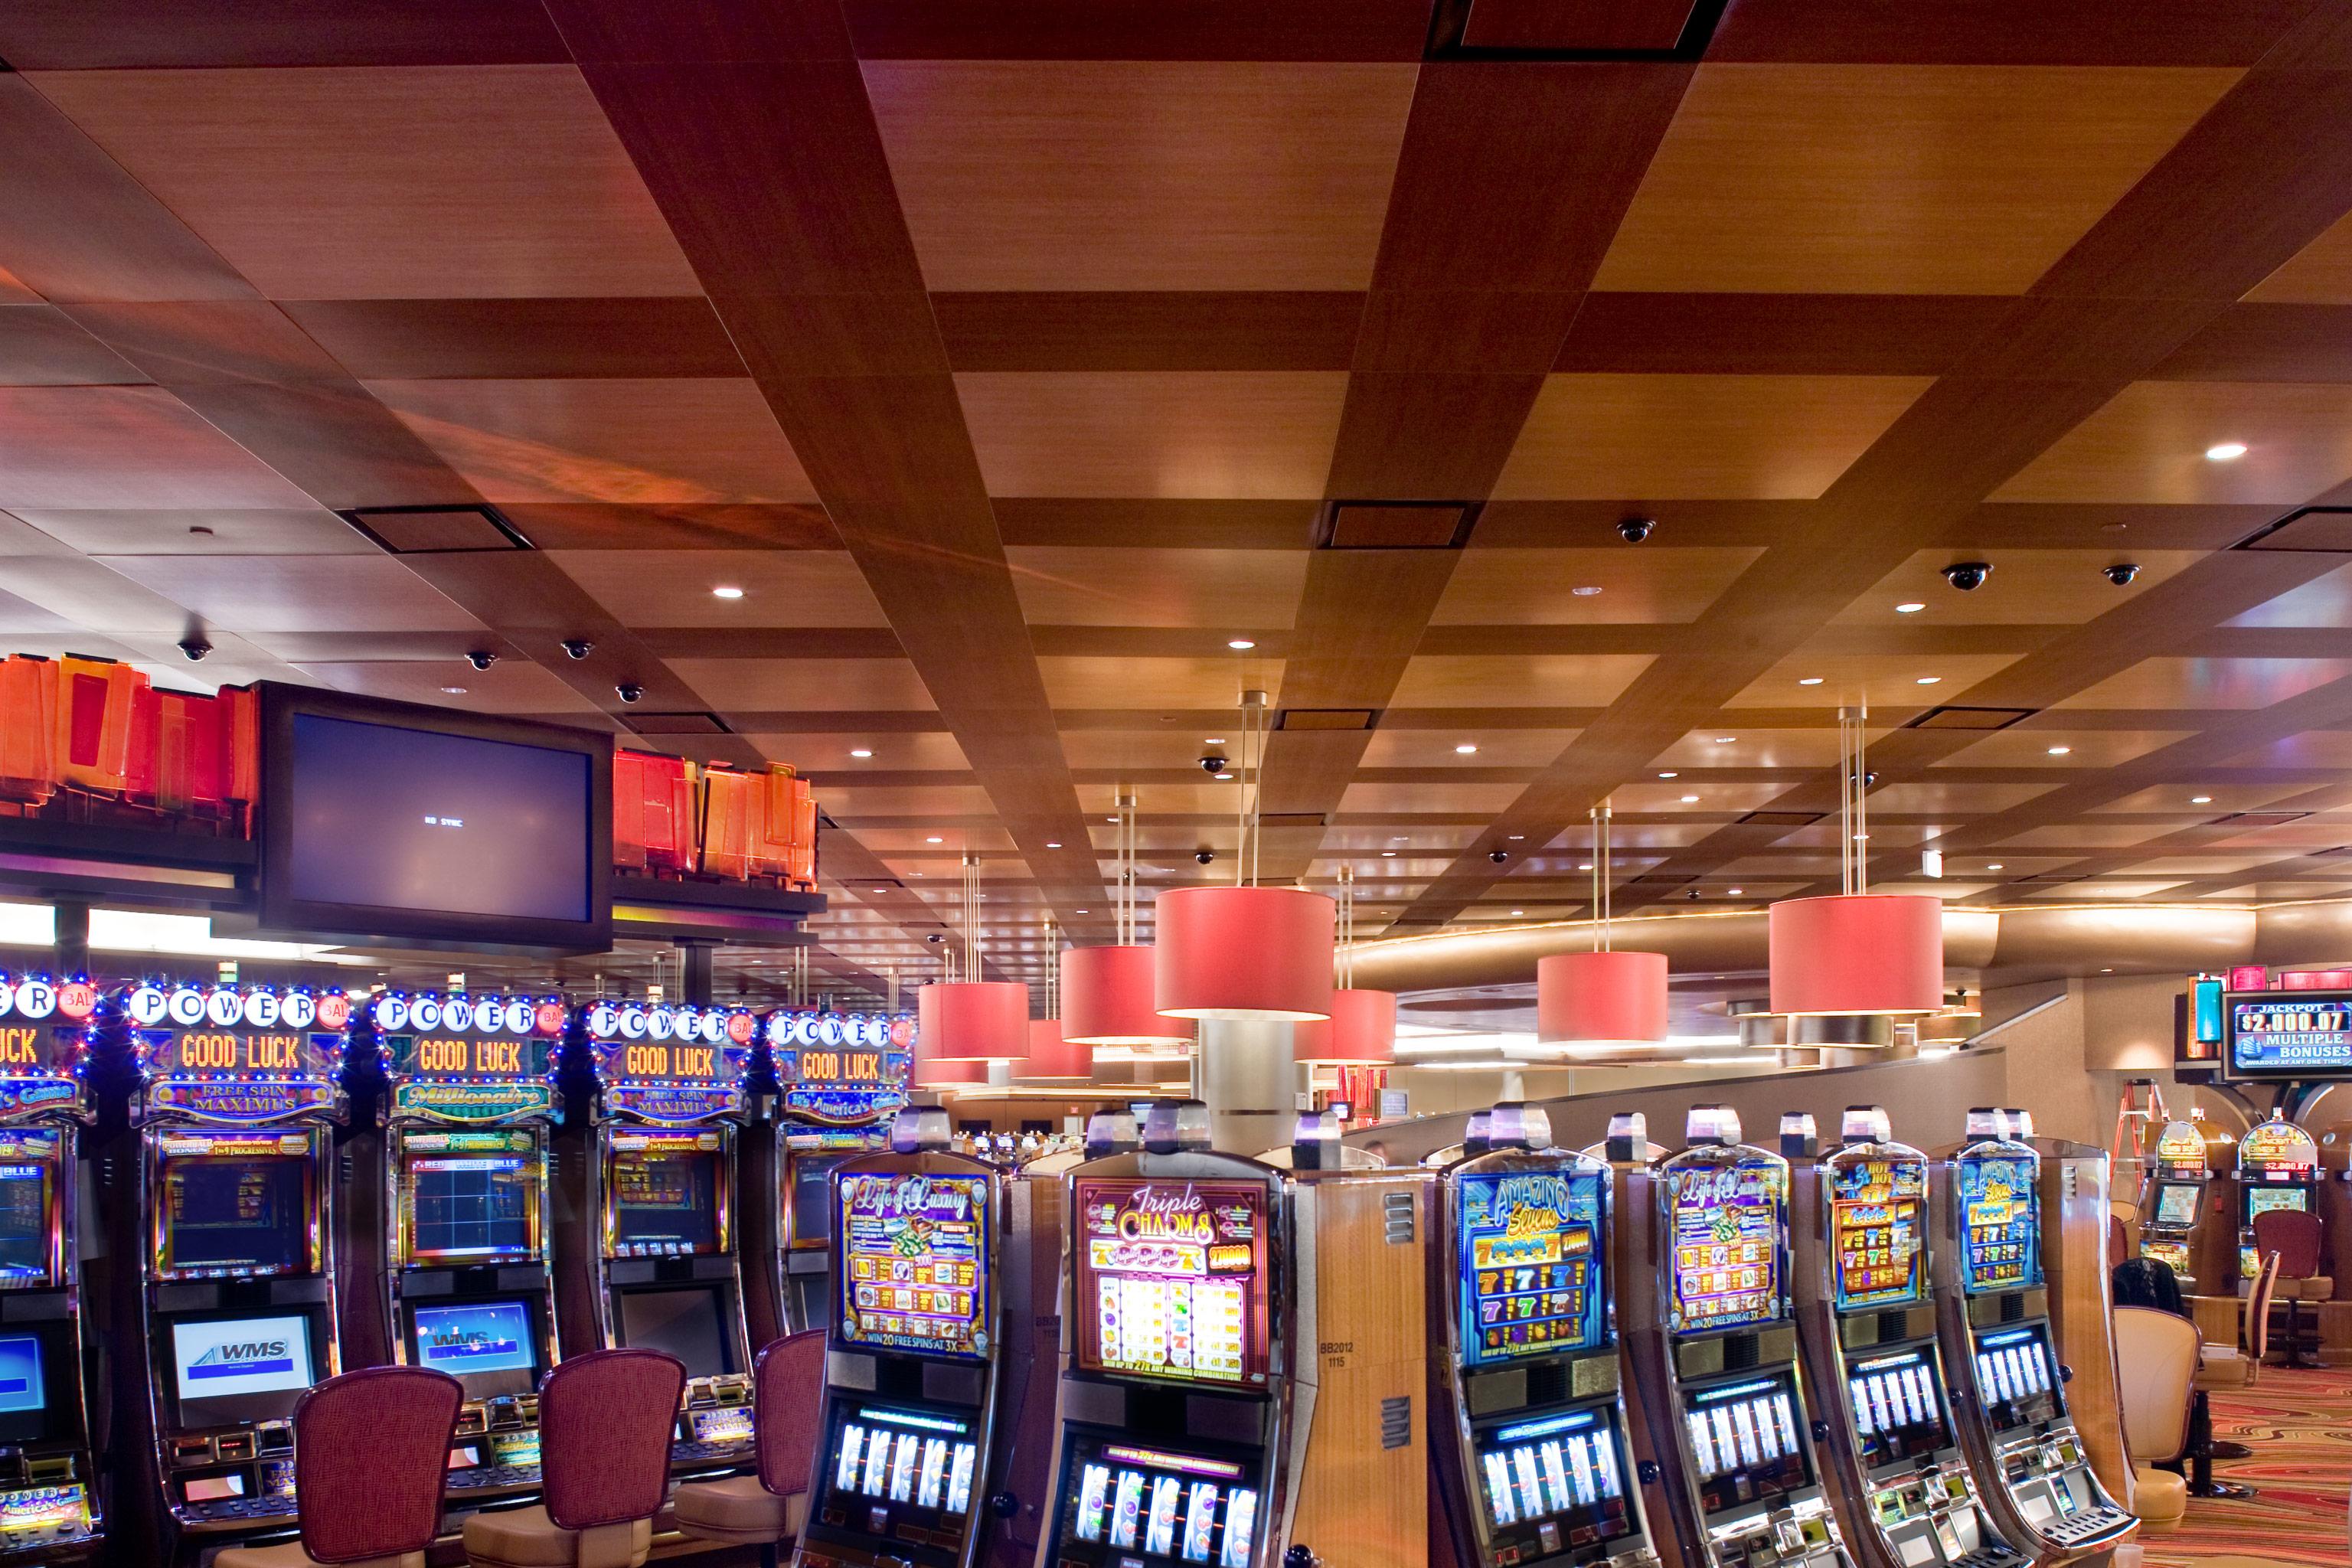 Lamiere casino stanley casino edinburgh